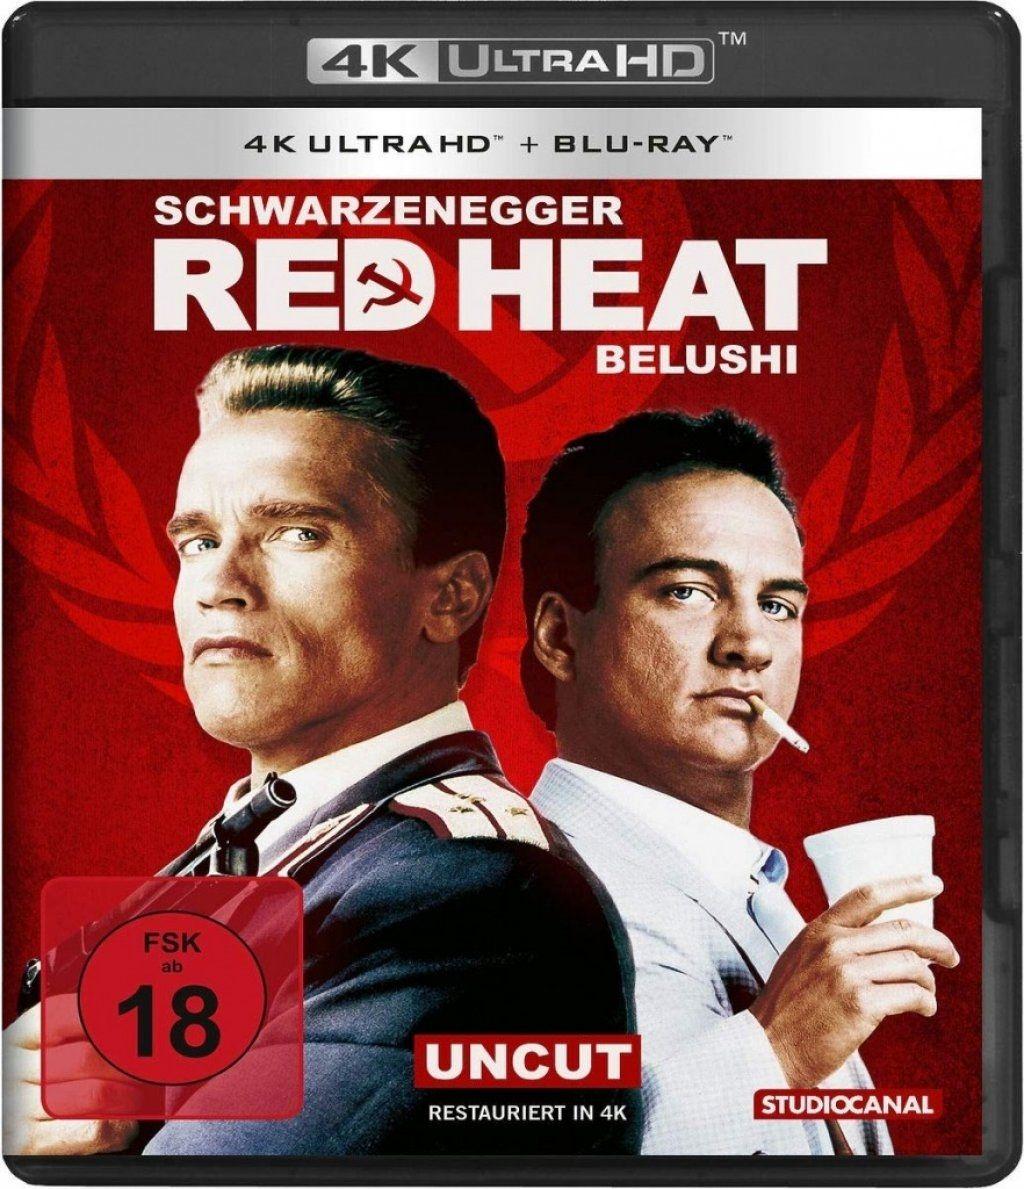 Red Heat (2 Discs) (UHD BLURAY + BLURAY)